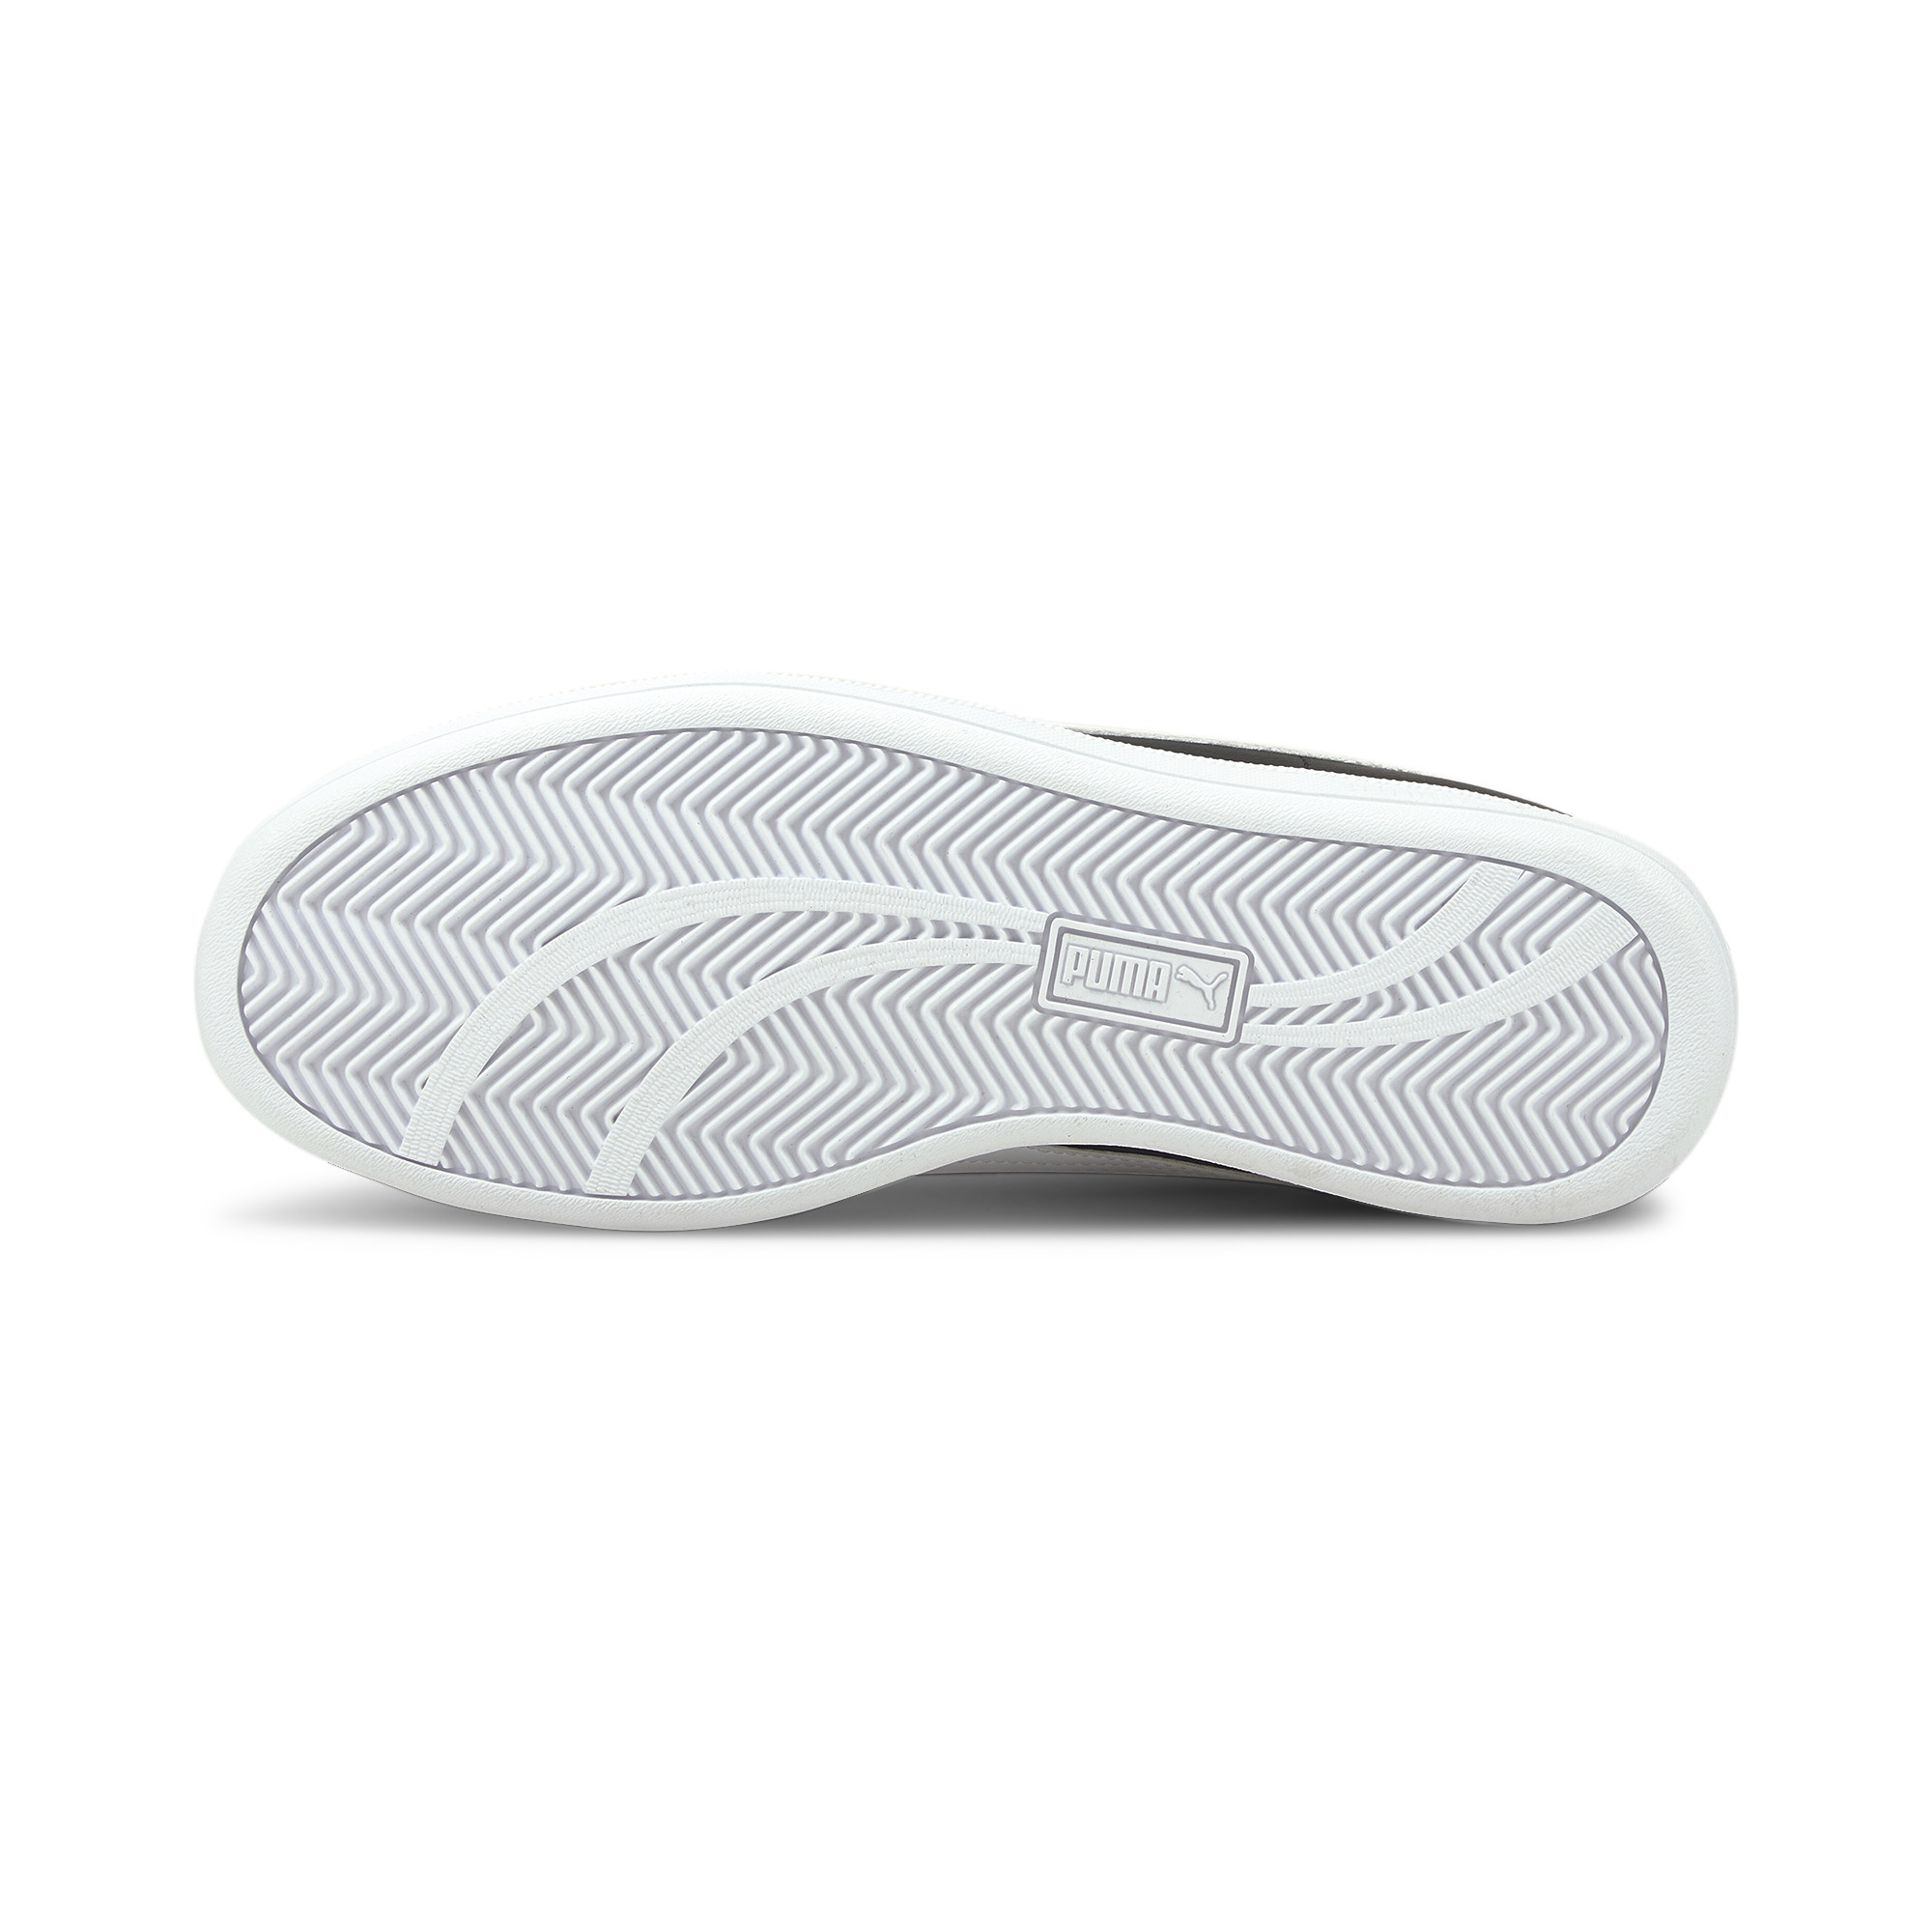 Indexbild 25 - PUMA Smash Trainers Schuhe Sneakers Sport Classics Unisex Neu